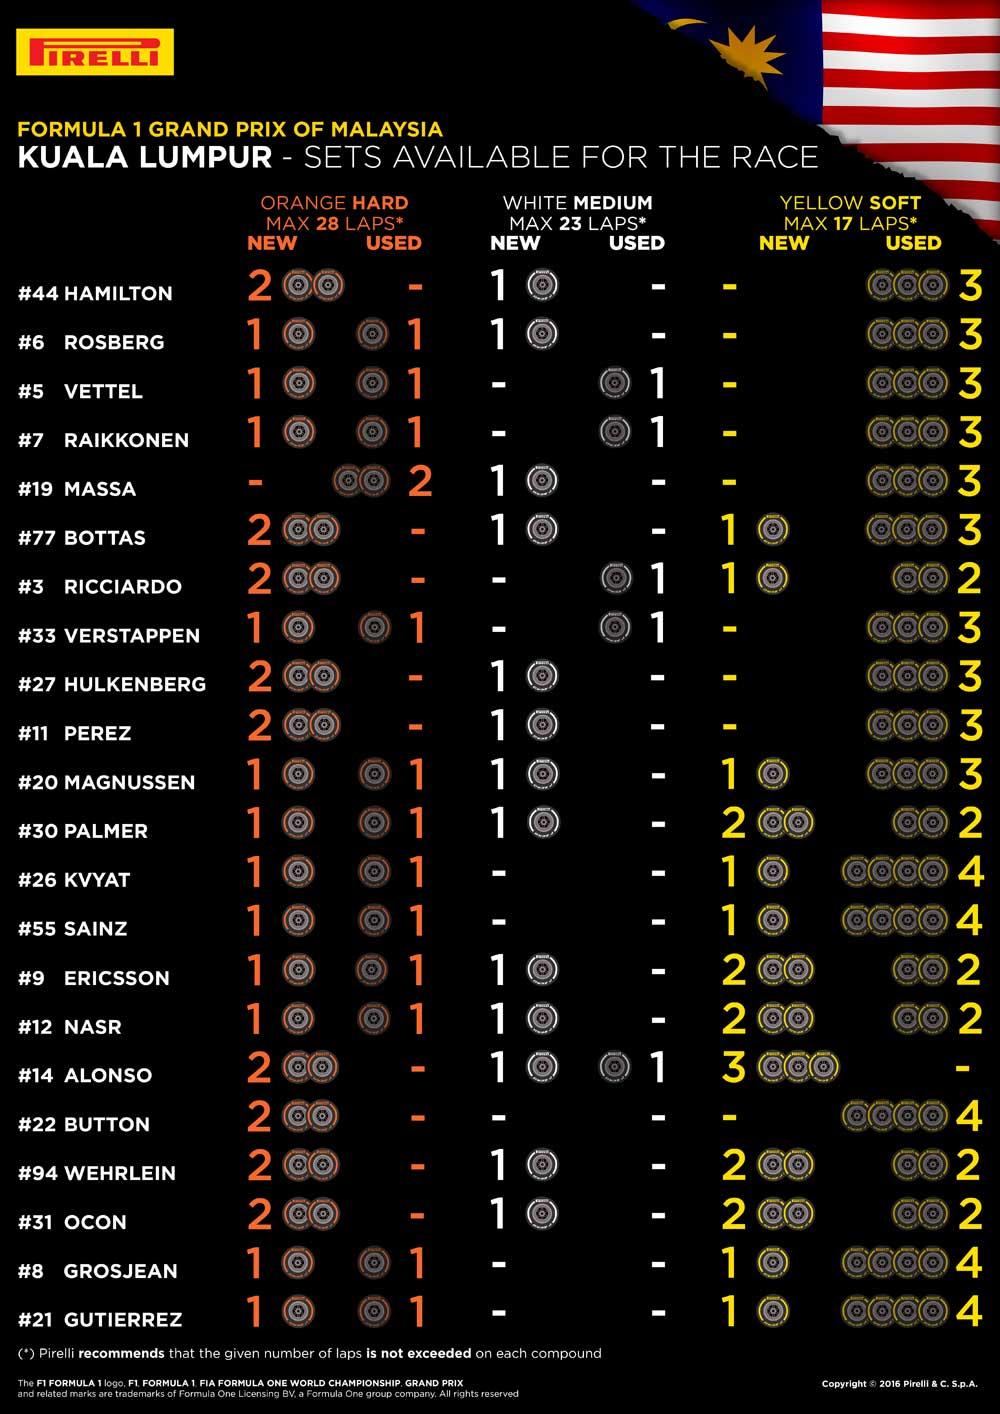 F1マレーシアGP決勝レース、22人のドライバーの「持ちタイヤ」